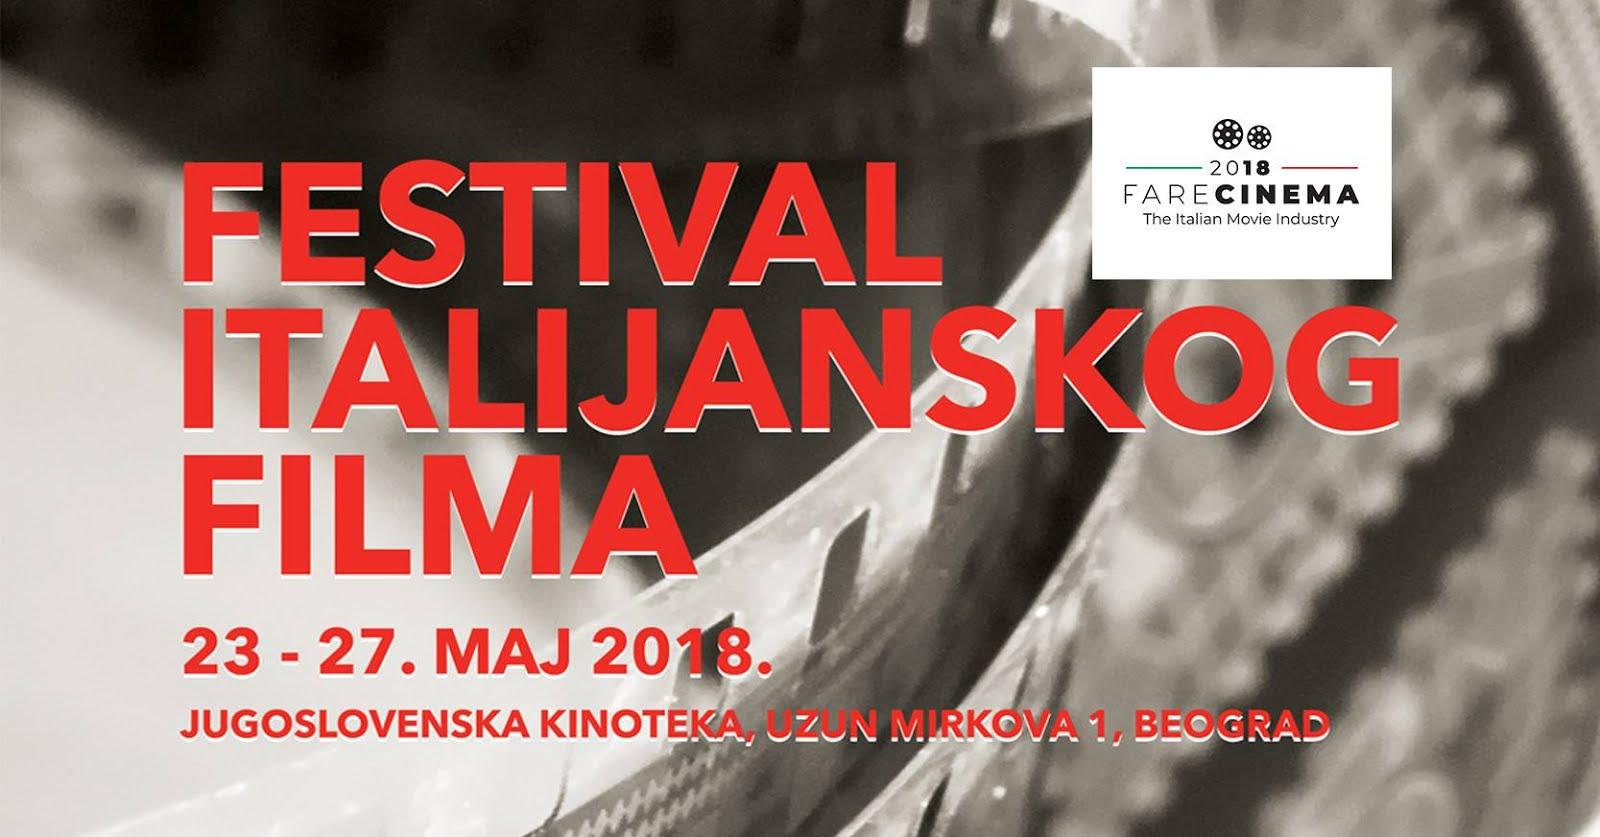 Festival italijanskog filma у Kinoteci